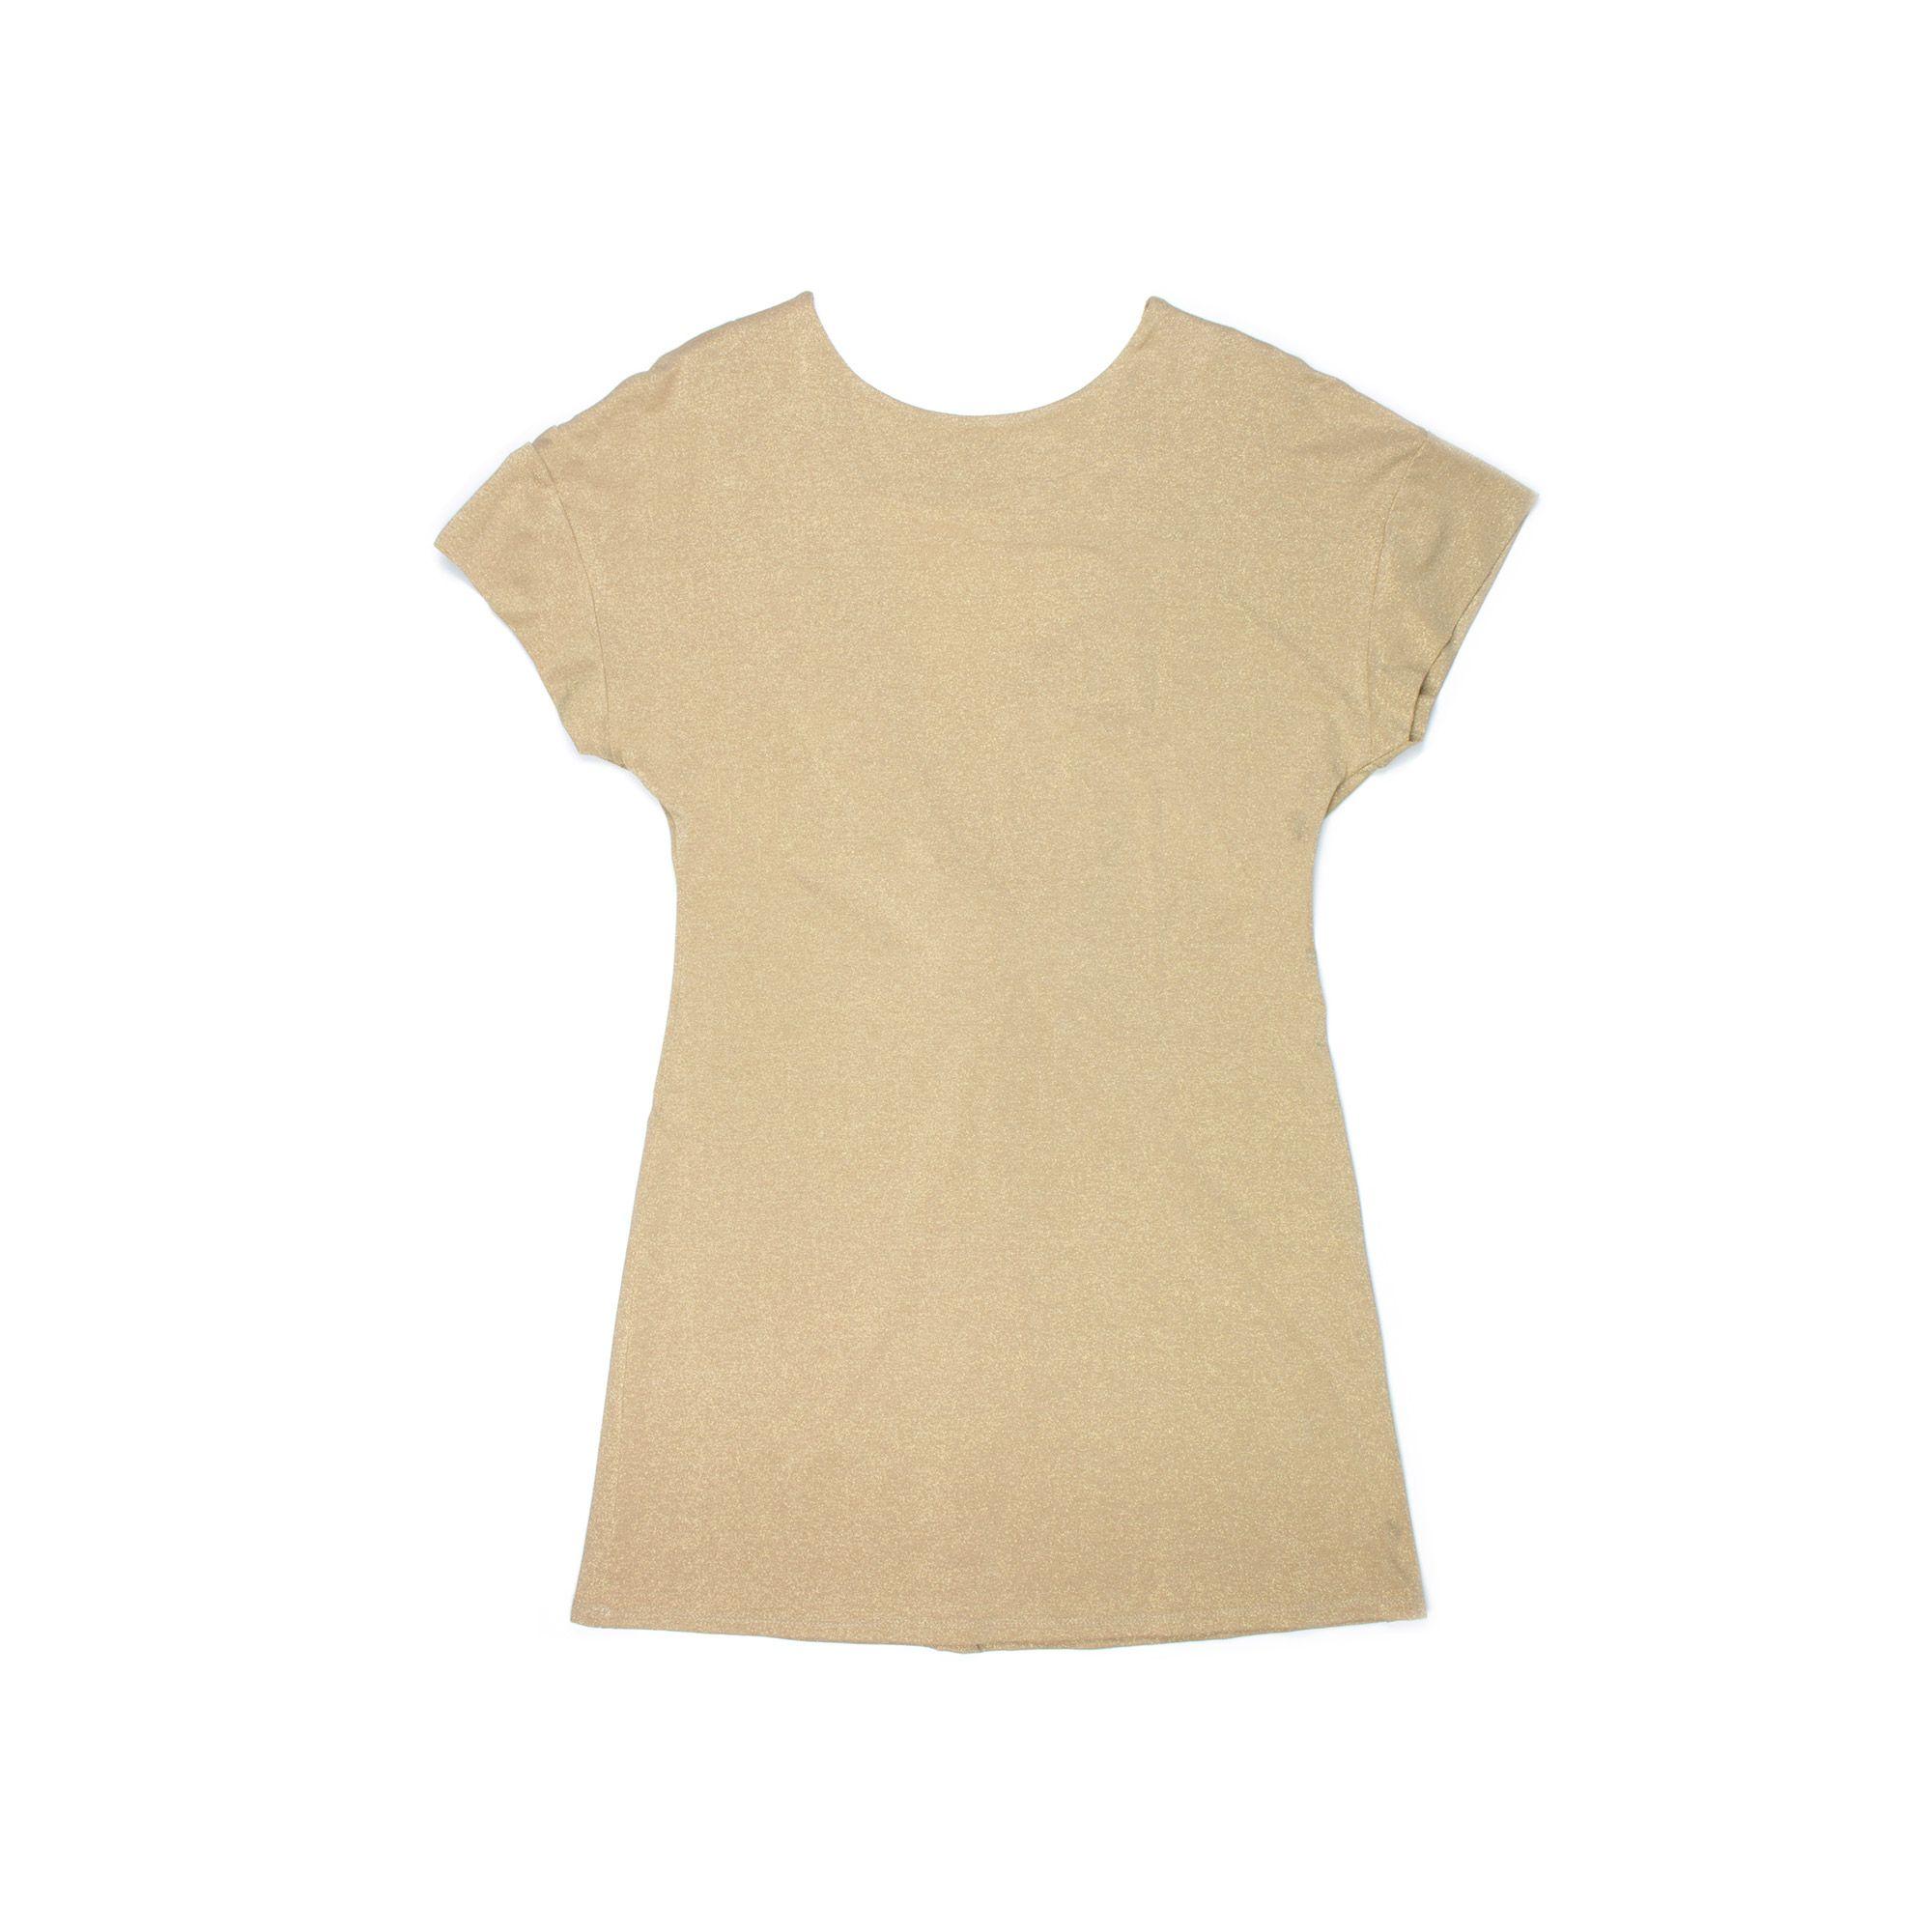 eleh scollatura schiena woman tank top ESSC139